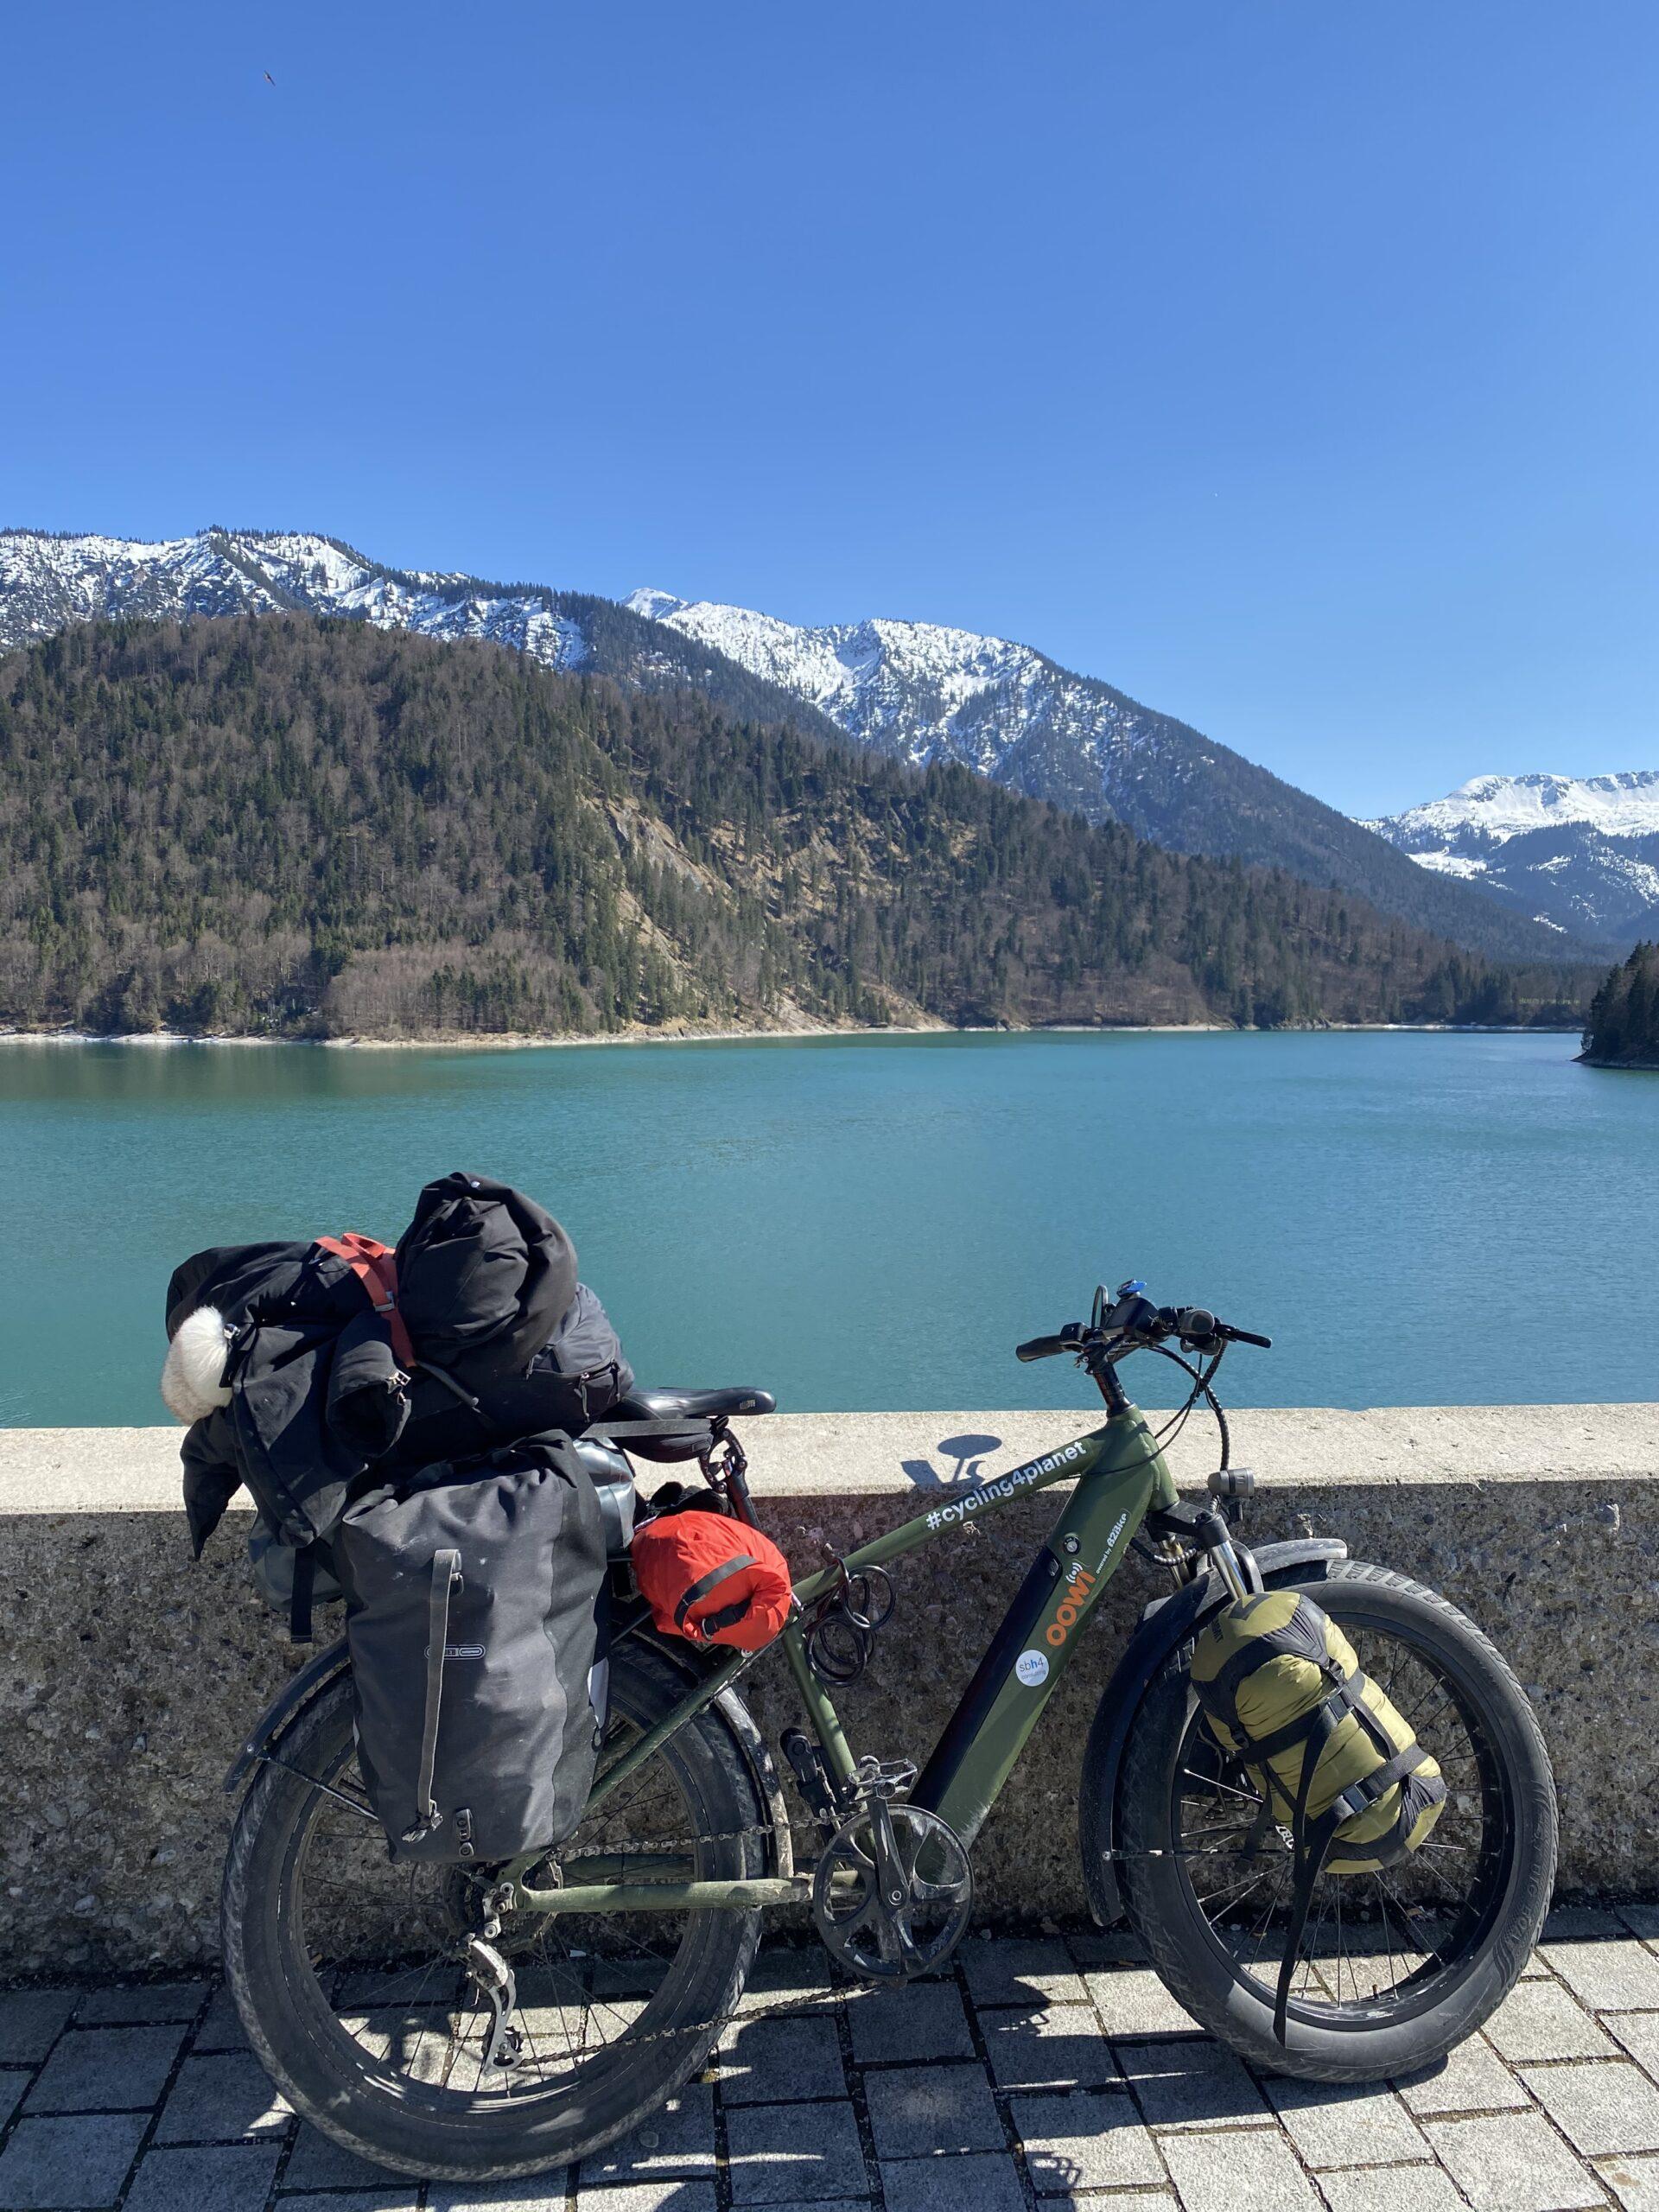 neige_alpes_vélo_lac